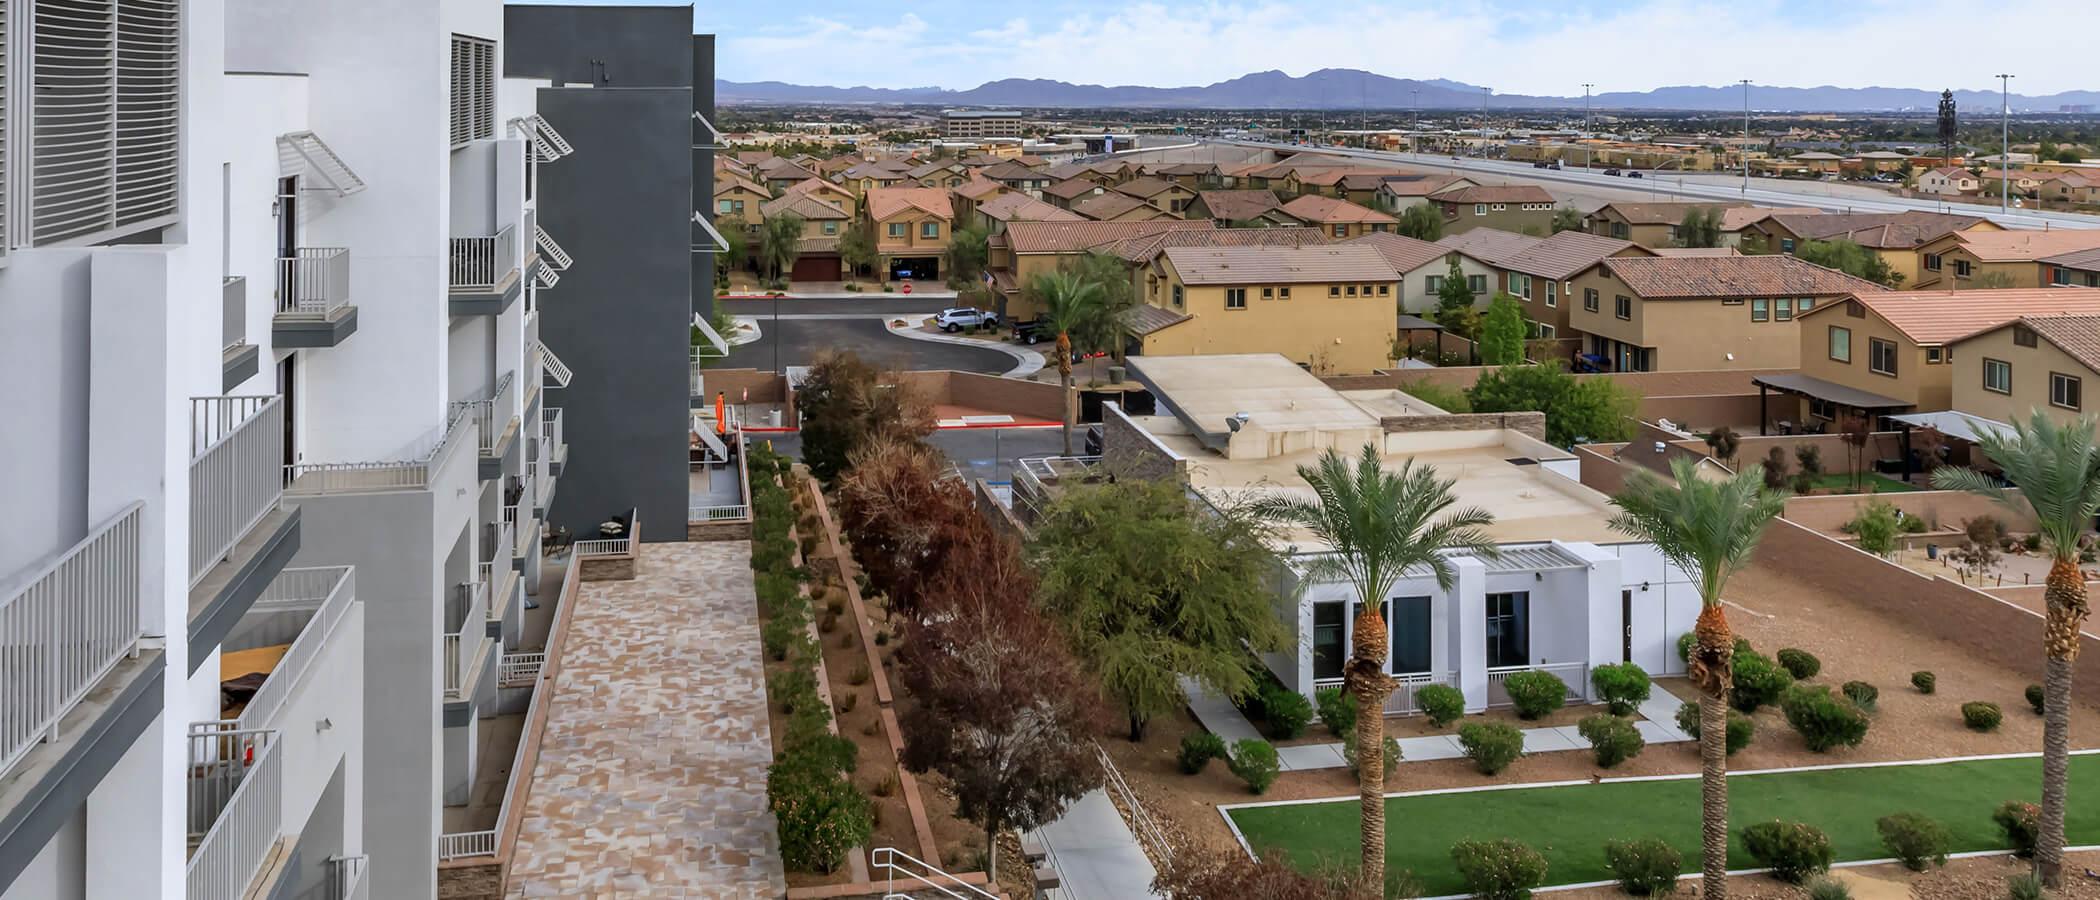 apartments near centennial hills las vegas nevada review